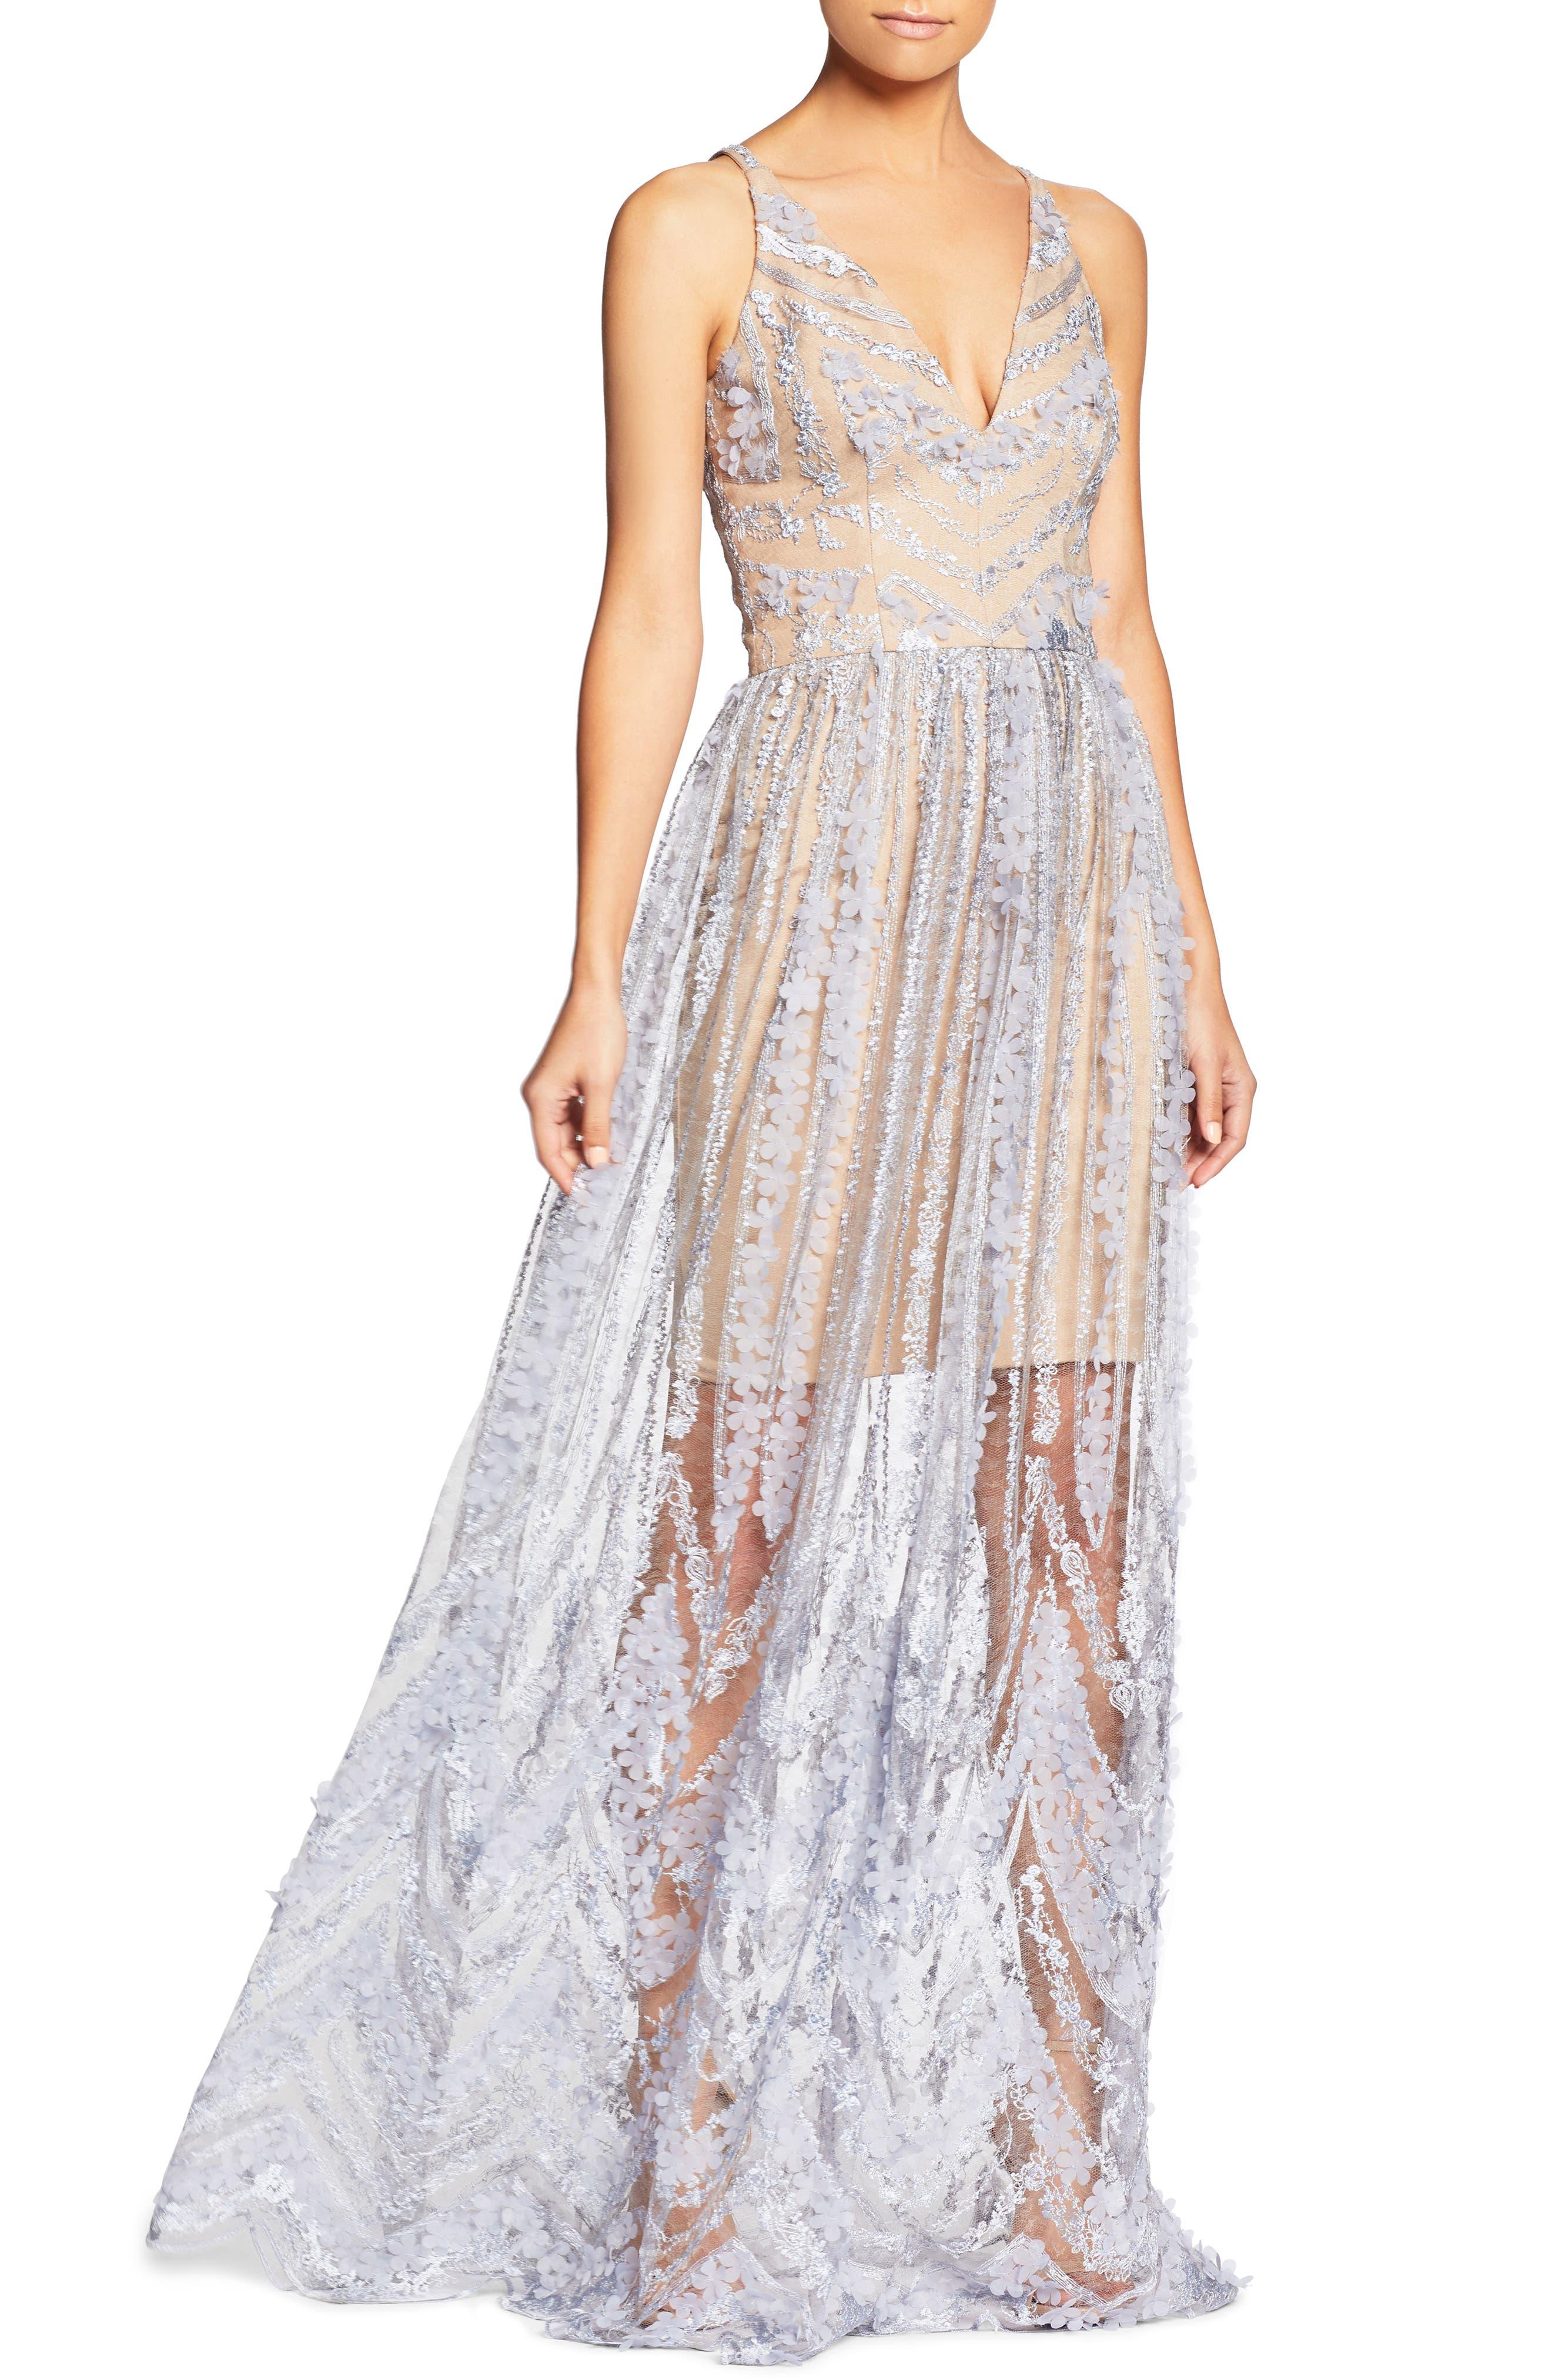 Lace Dresses Prom Dresses